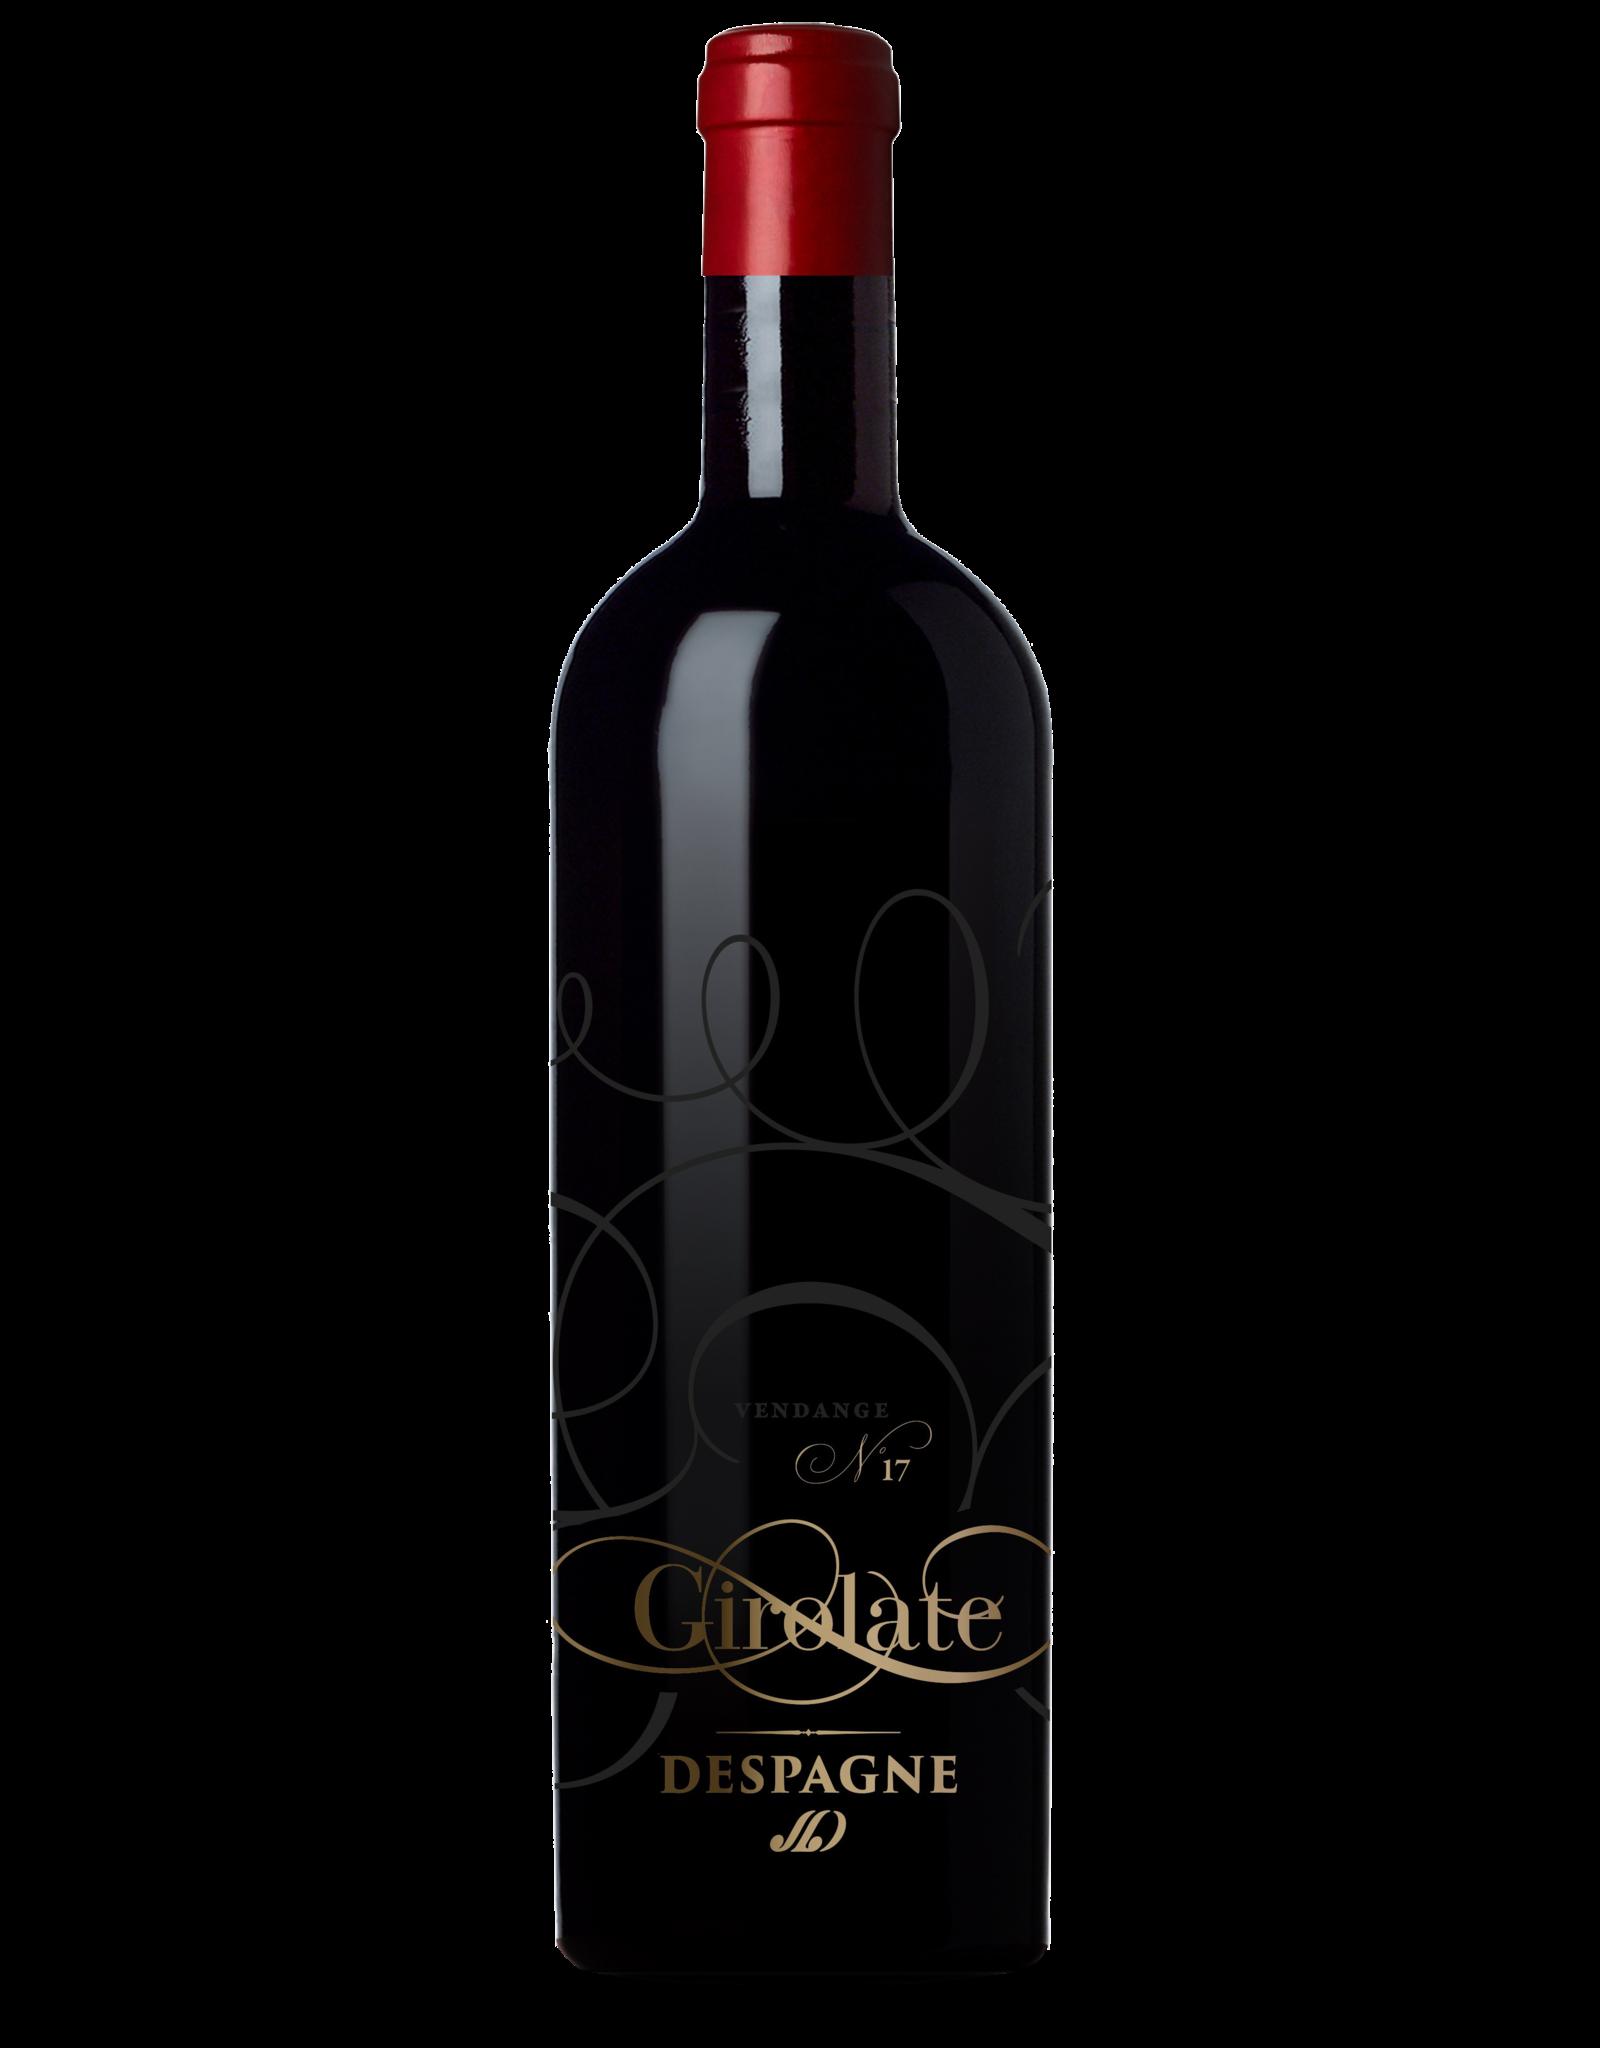 Château Rauzan Despagne Girolate Rouge 2015 - Bordeaux